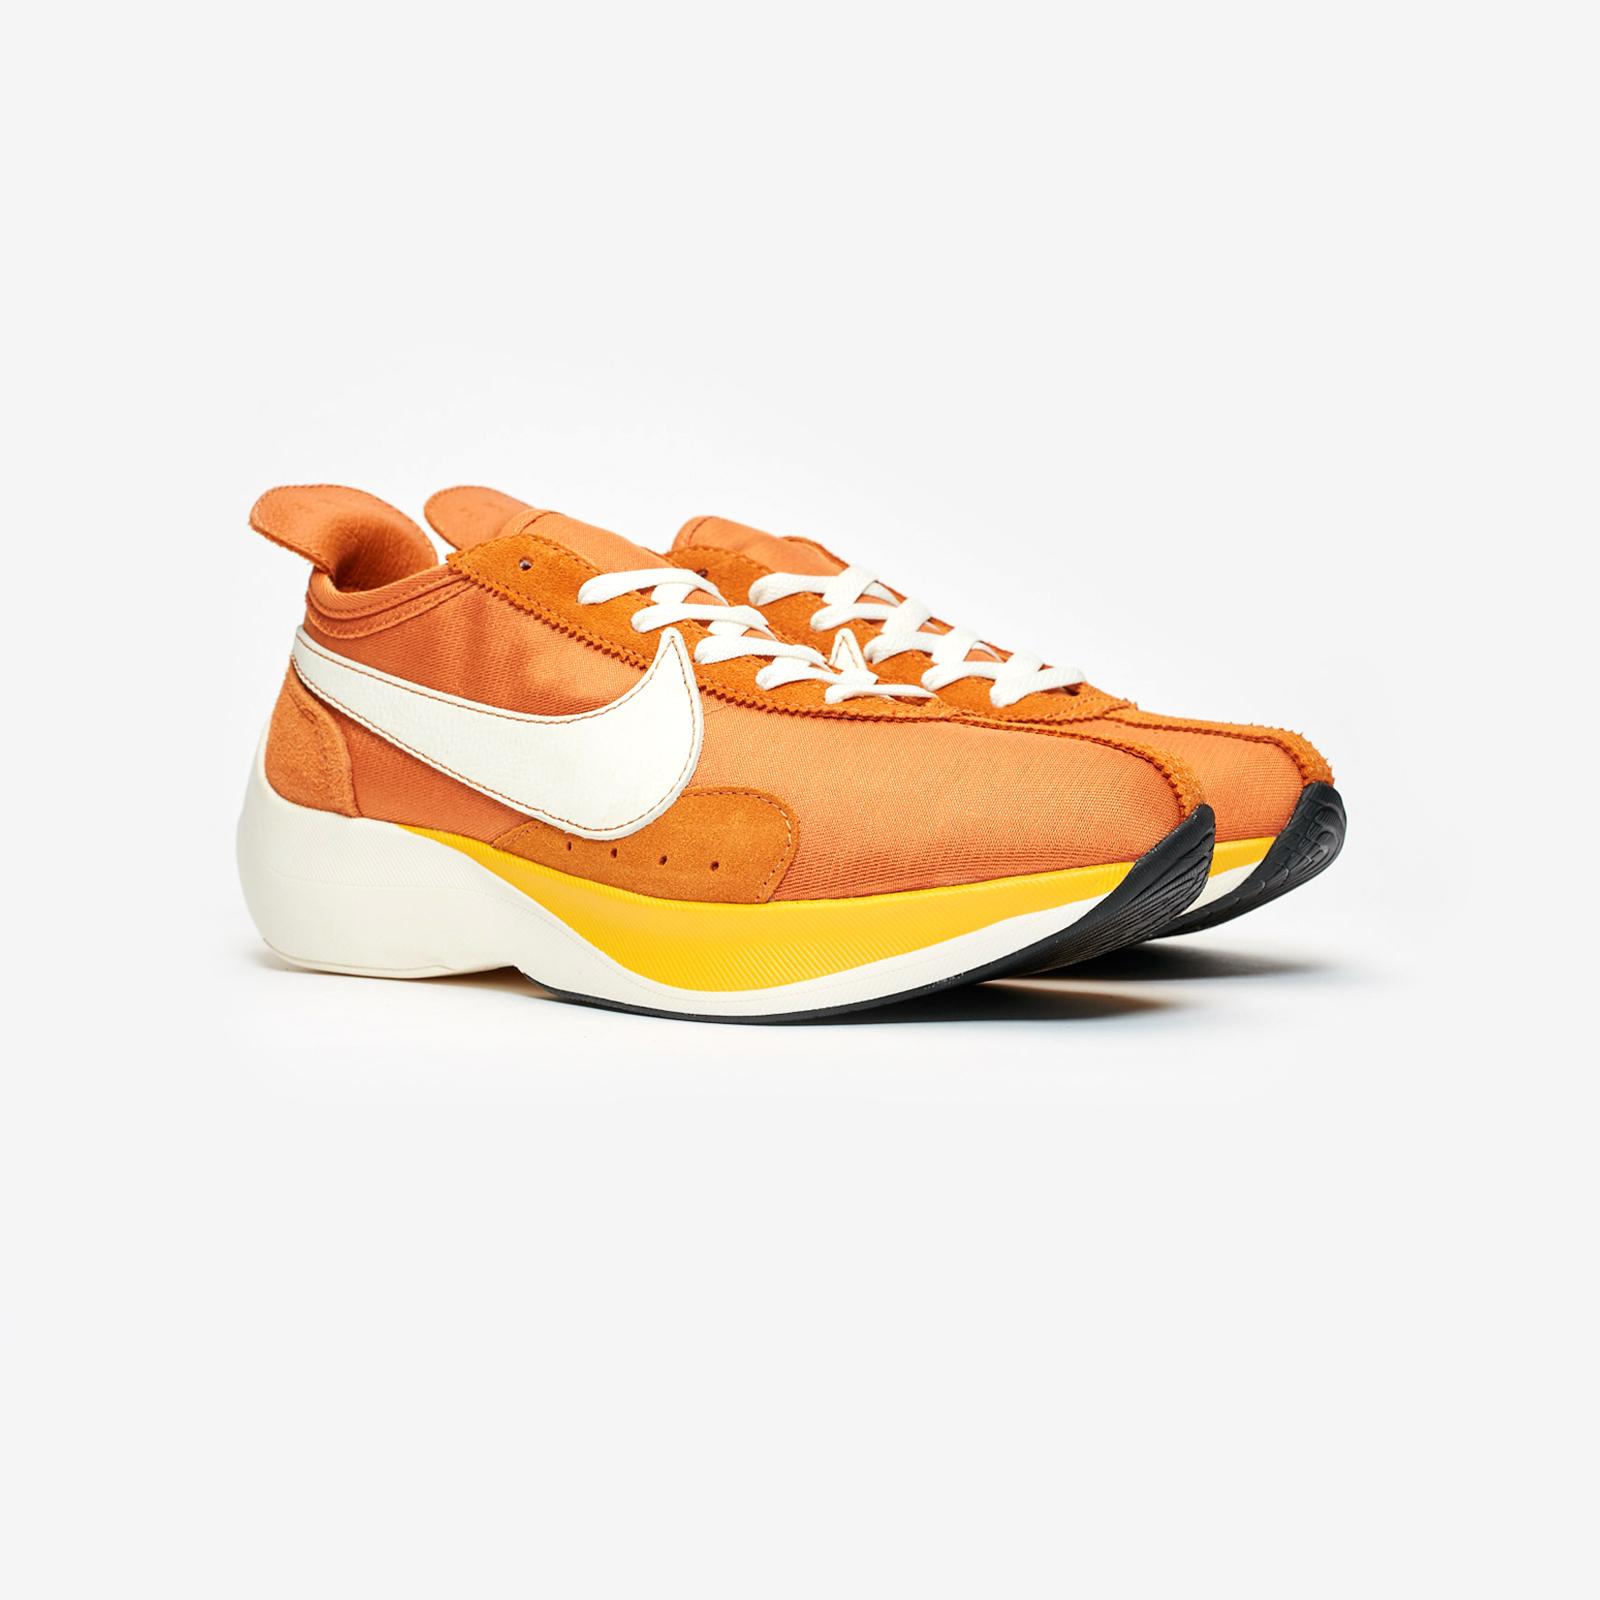 e1ebbda6a2c Nike Moon Racer QS - Bv7779-800 - Sneakersnstuff